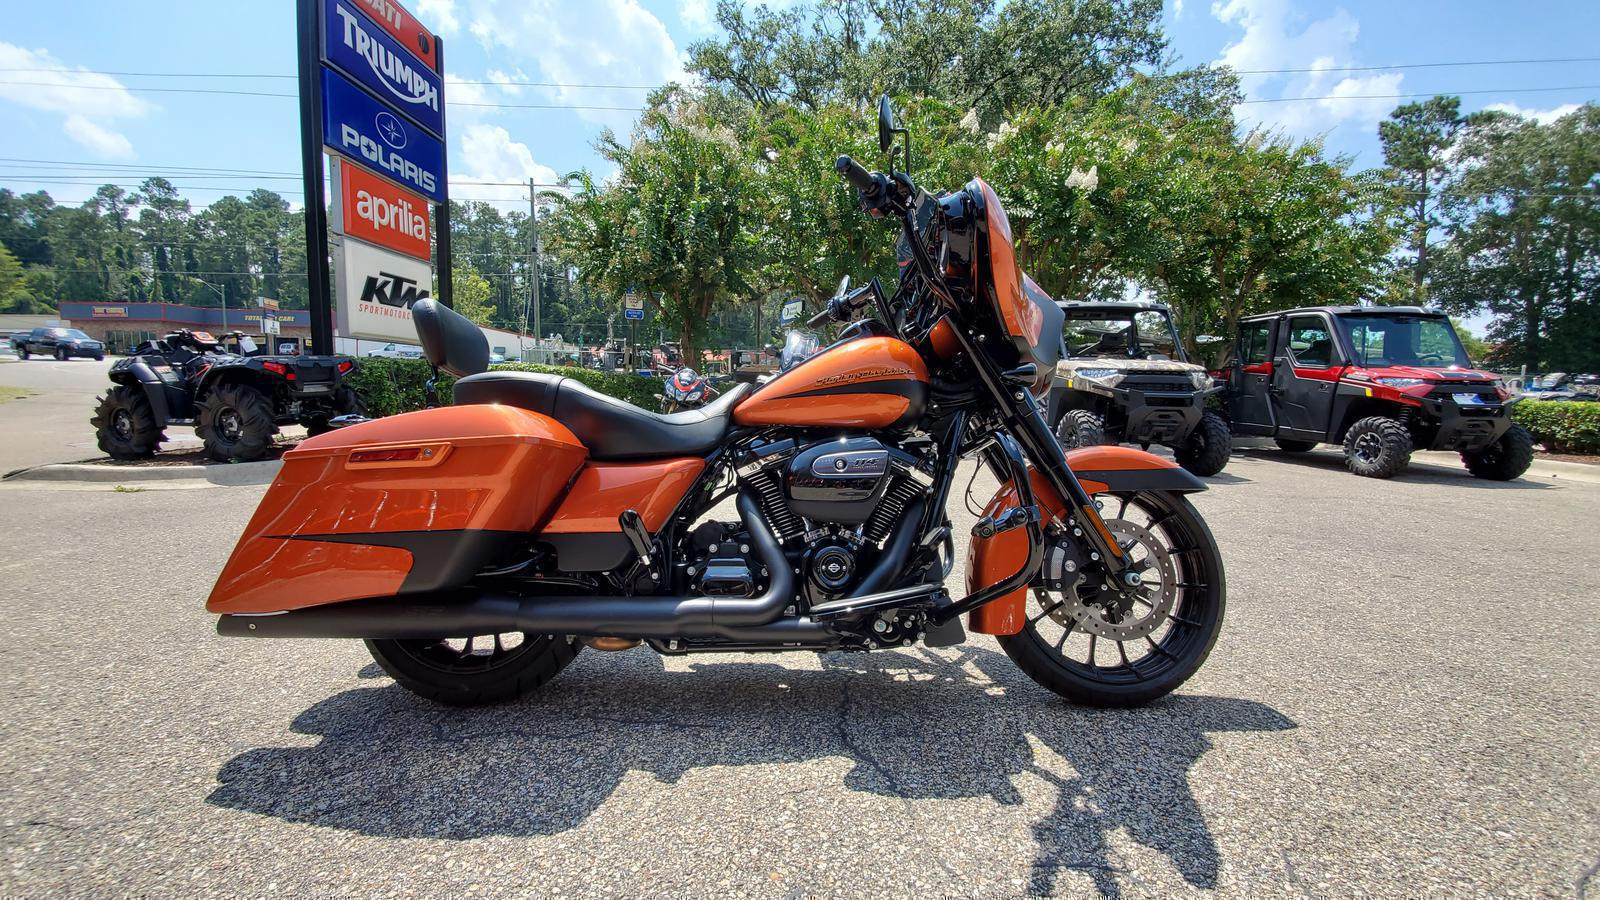 Street Glide For Sale >> 2019 Harley Davidson Street Glide Special